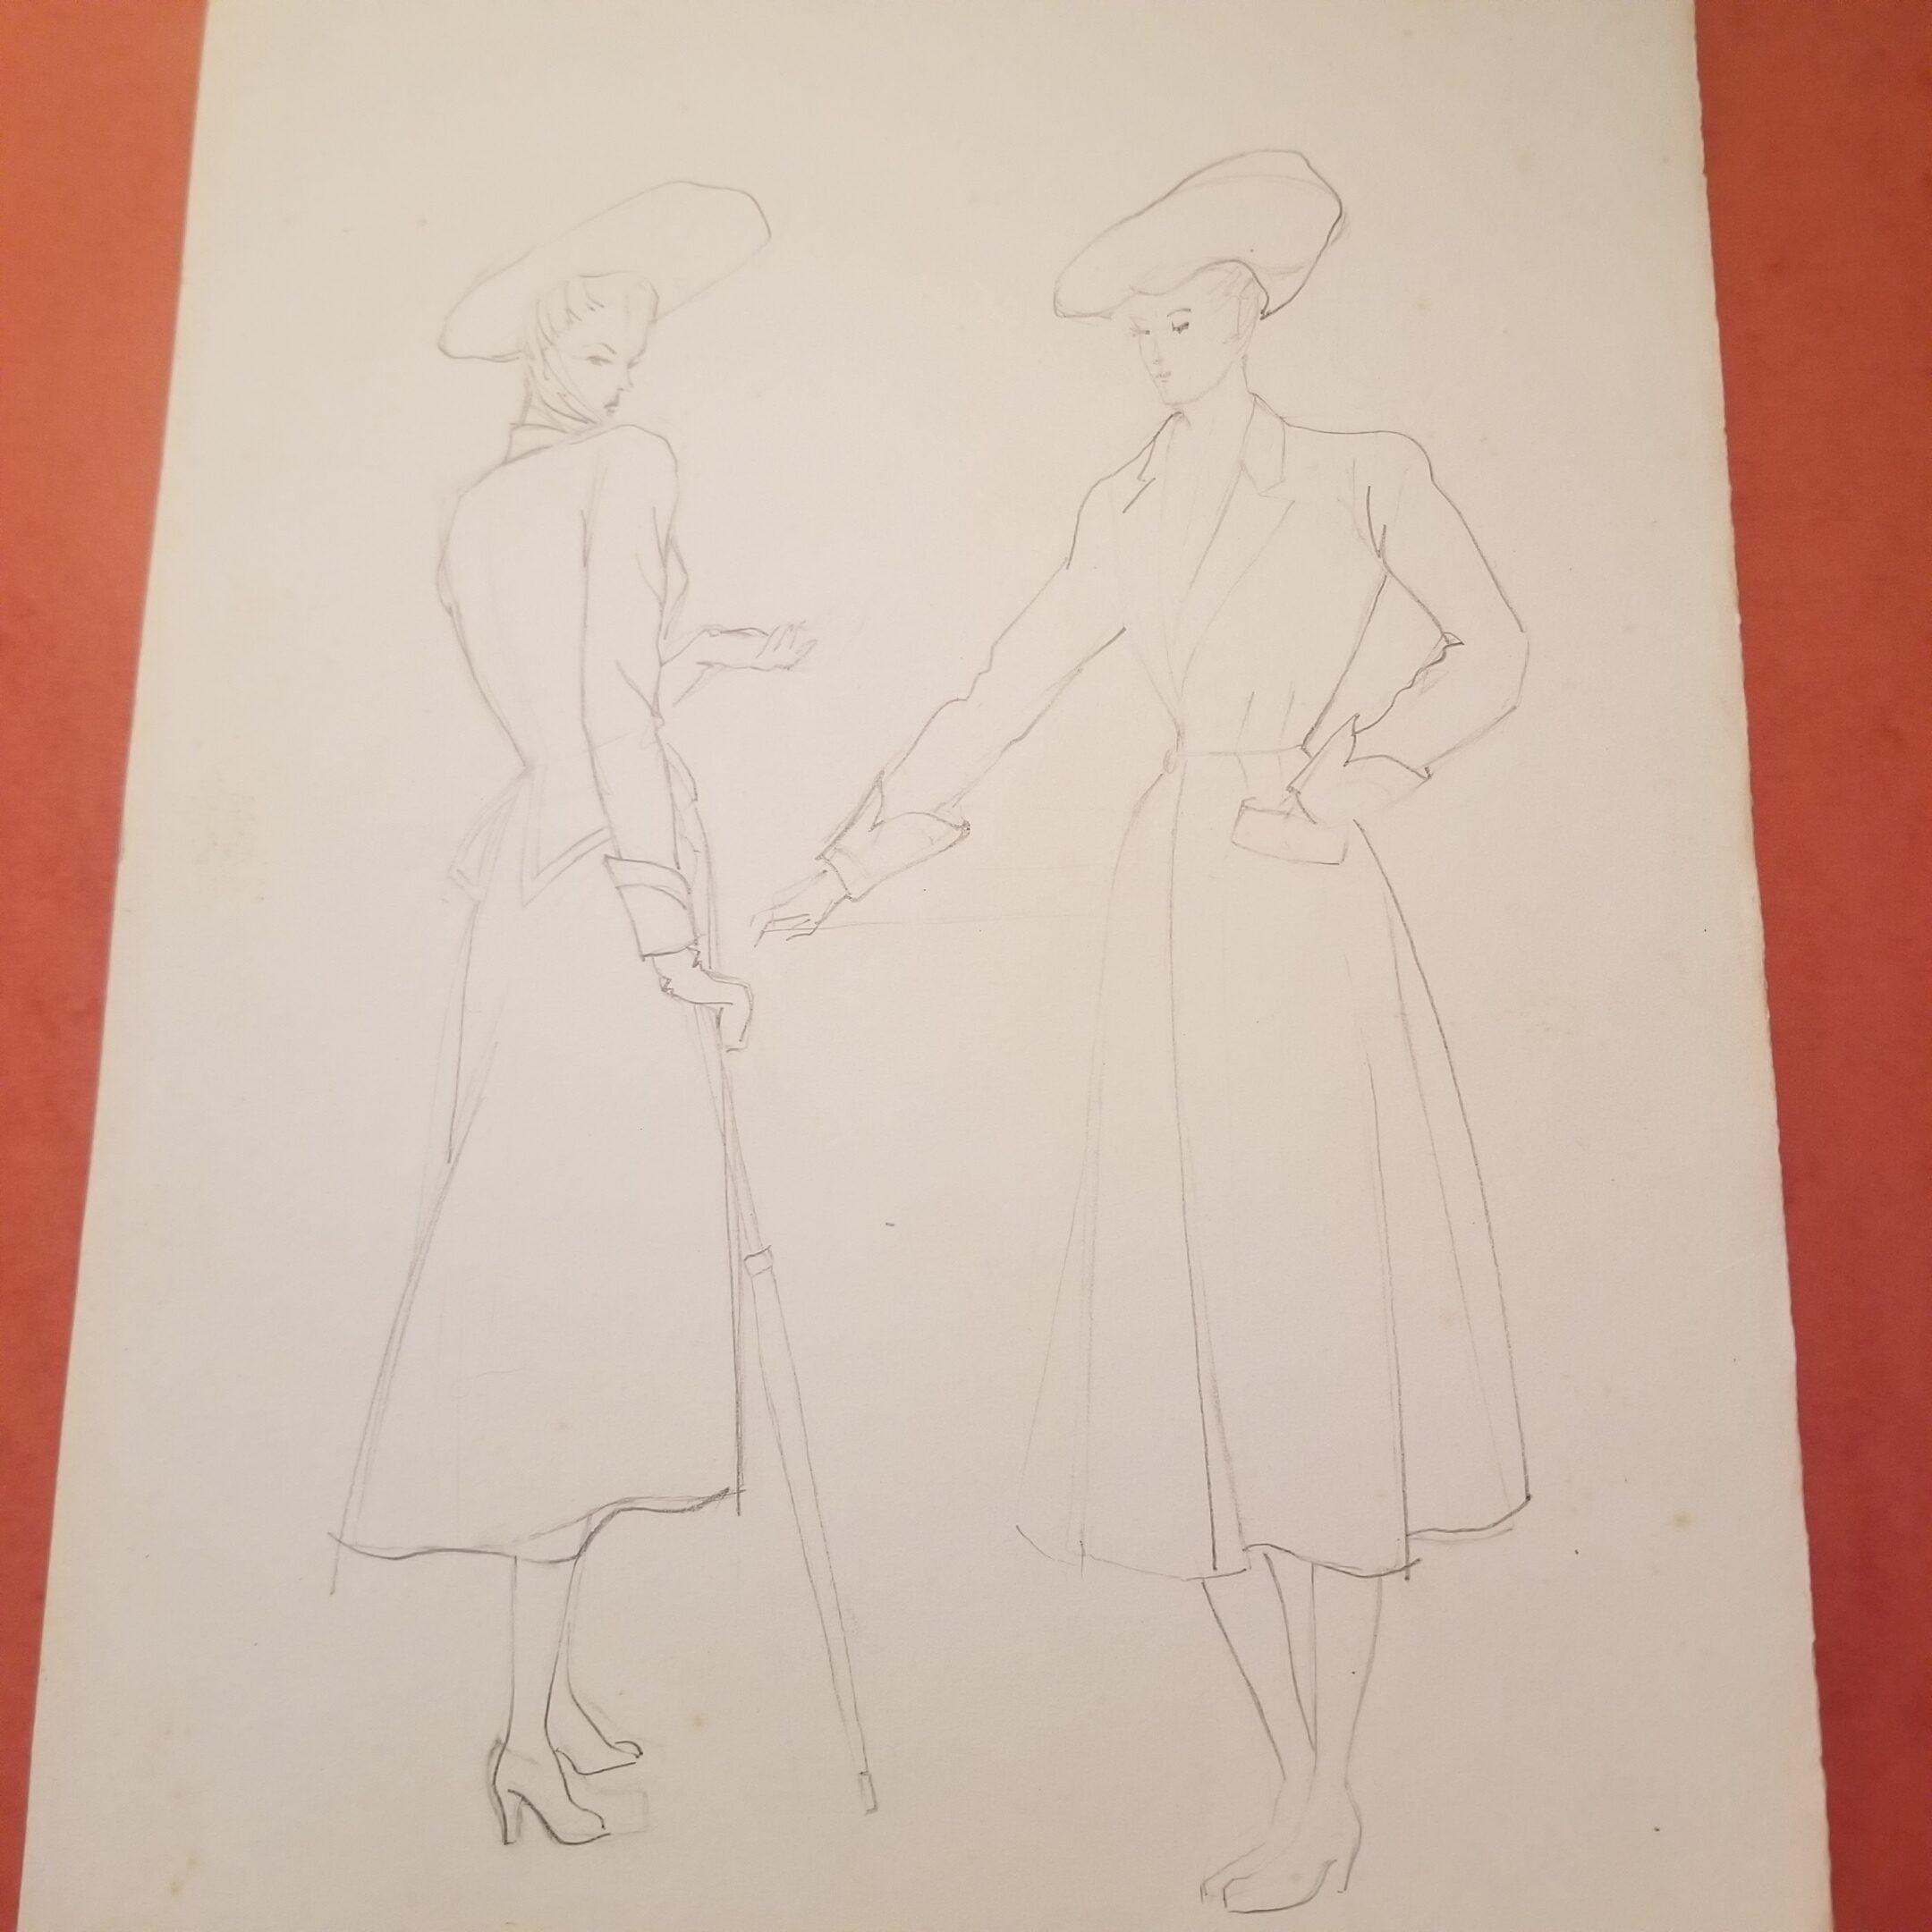 1940s fashion illustration